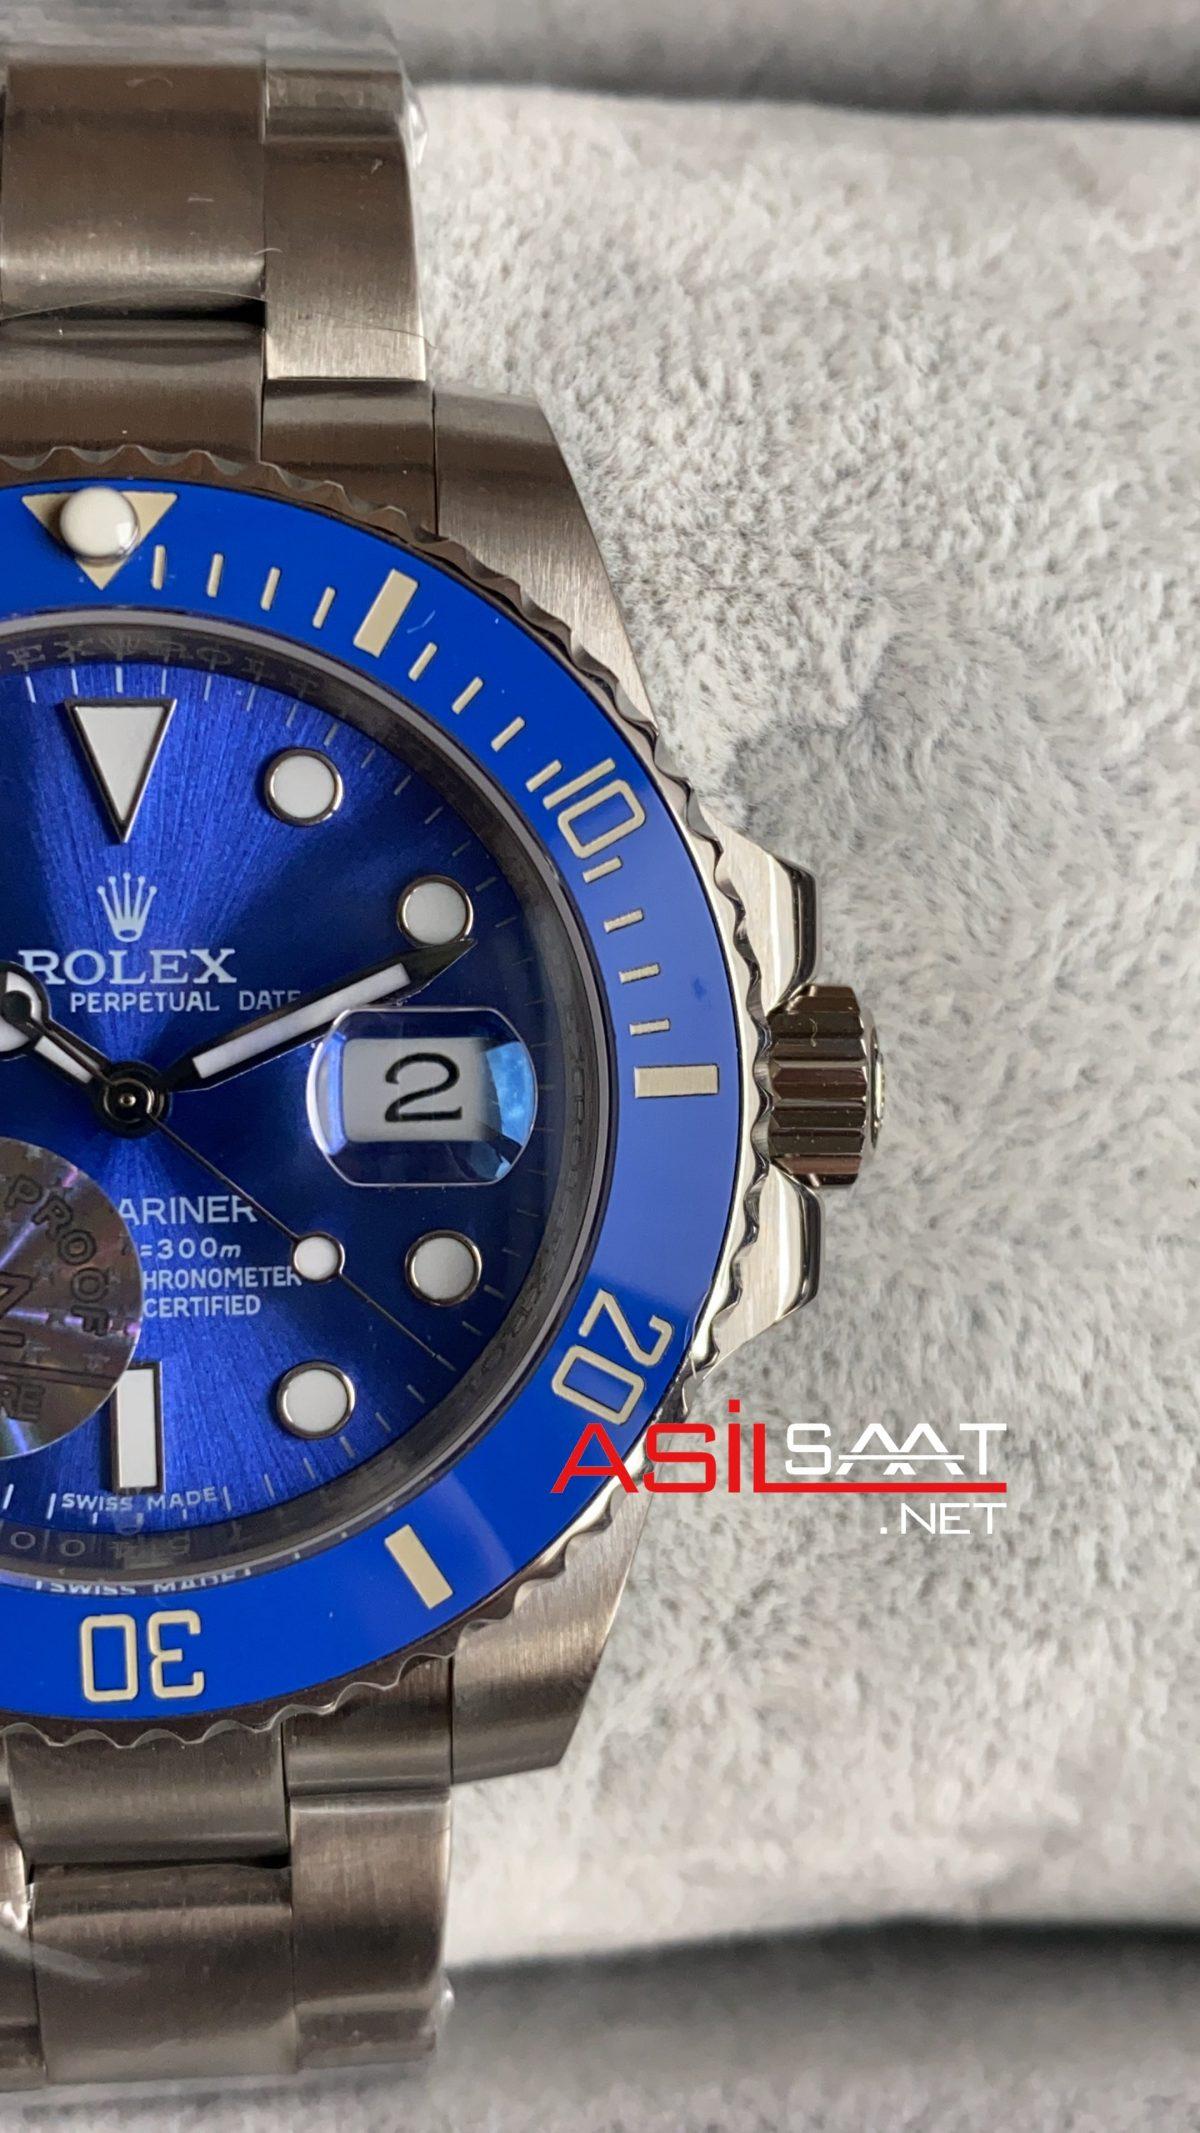 Rolex Submariner Smurf 116619LB ROLS005